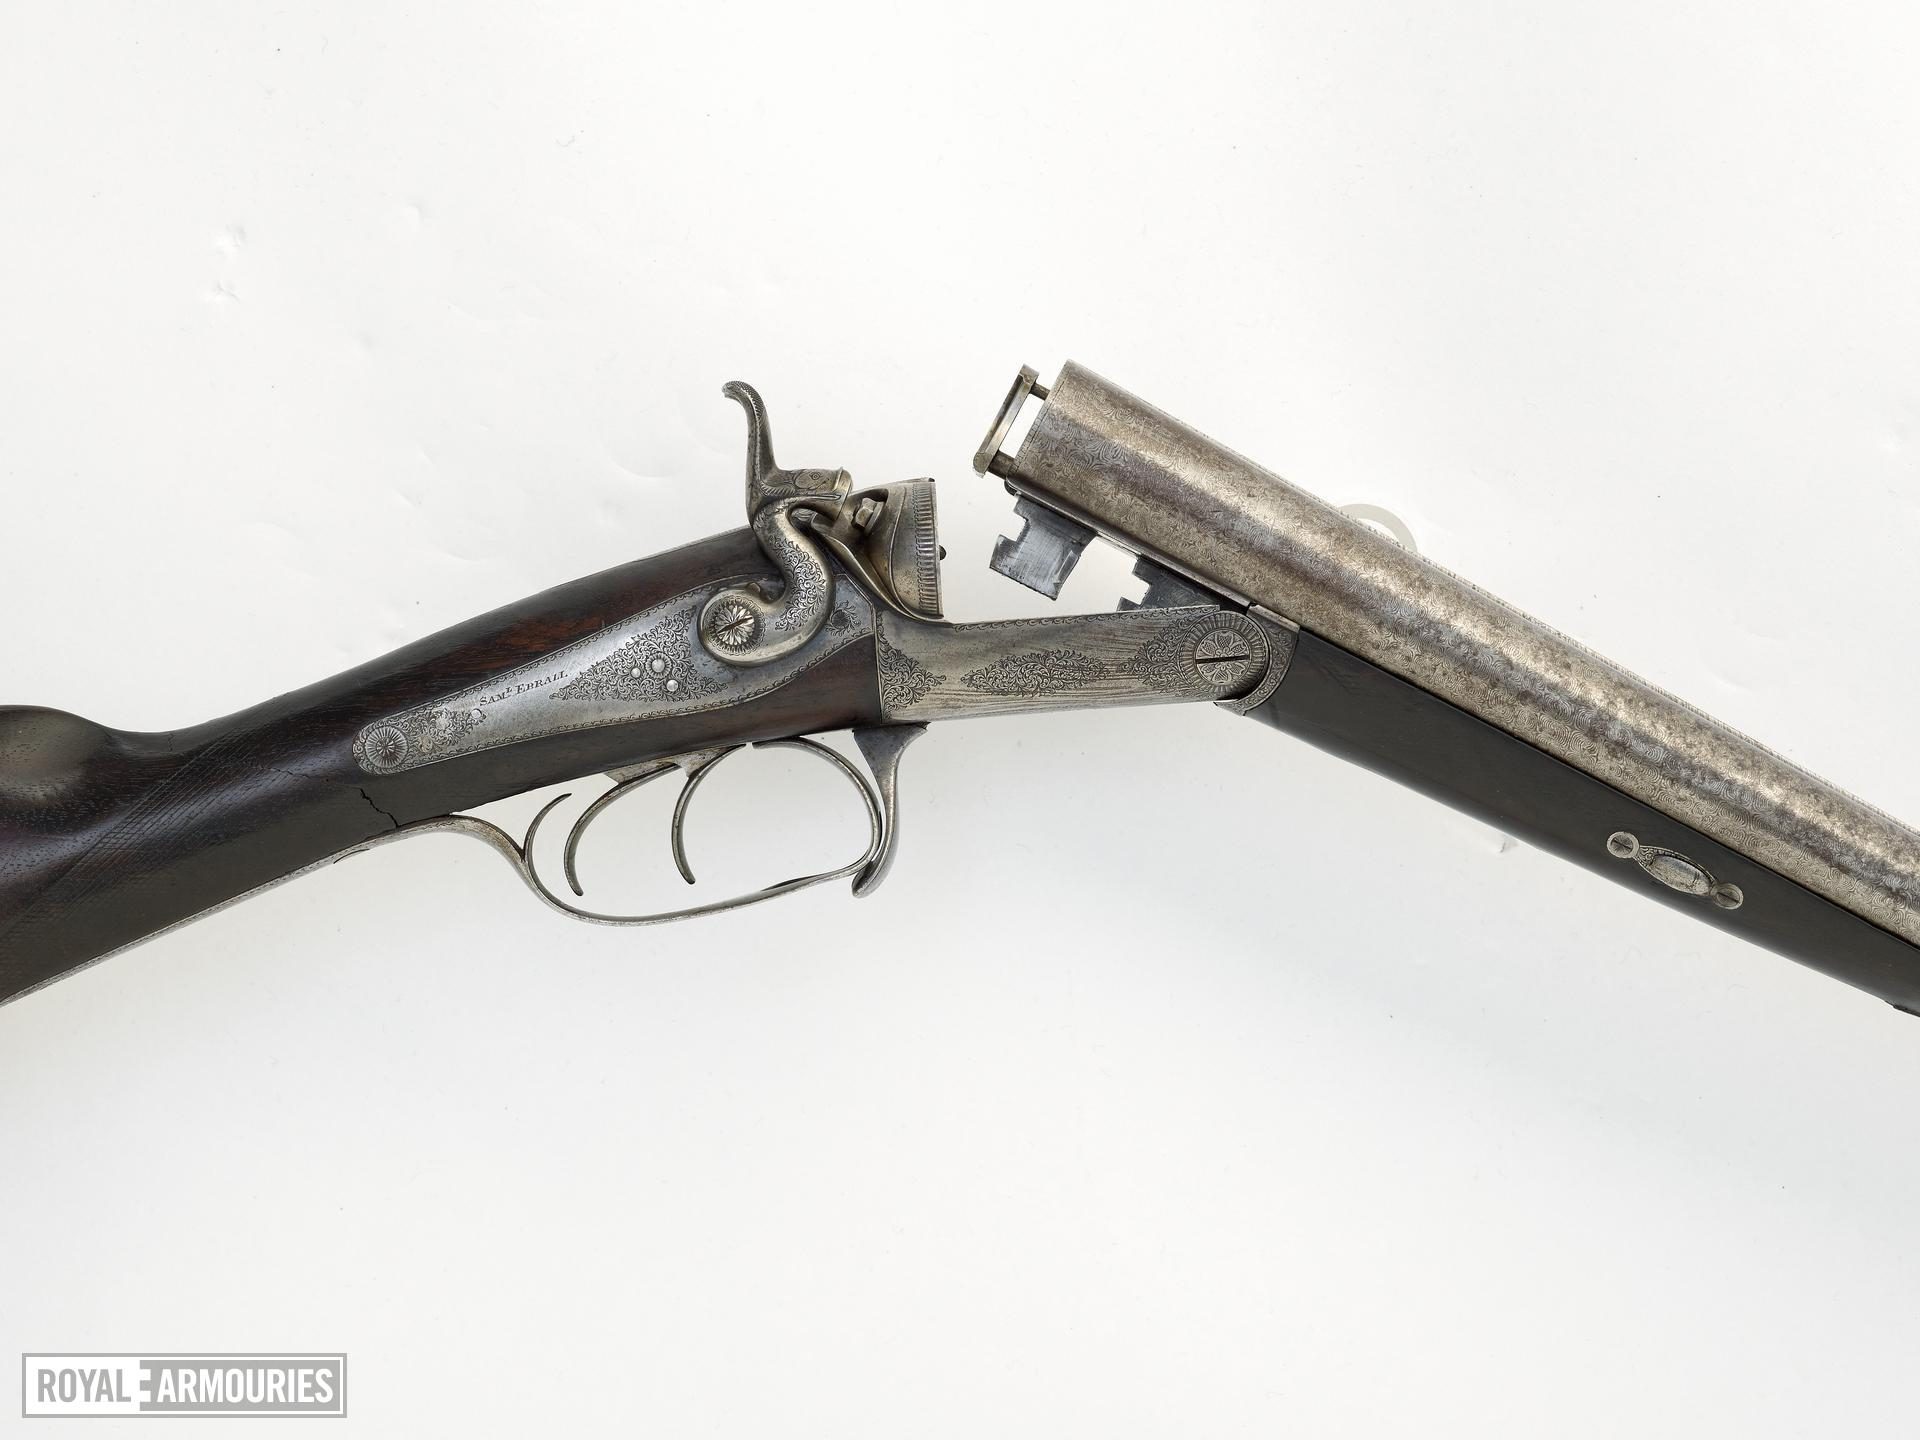 Centrefire breech-loading double-barrelled shotgun - By Samual Ebbal (1845-1865)